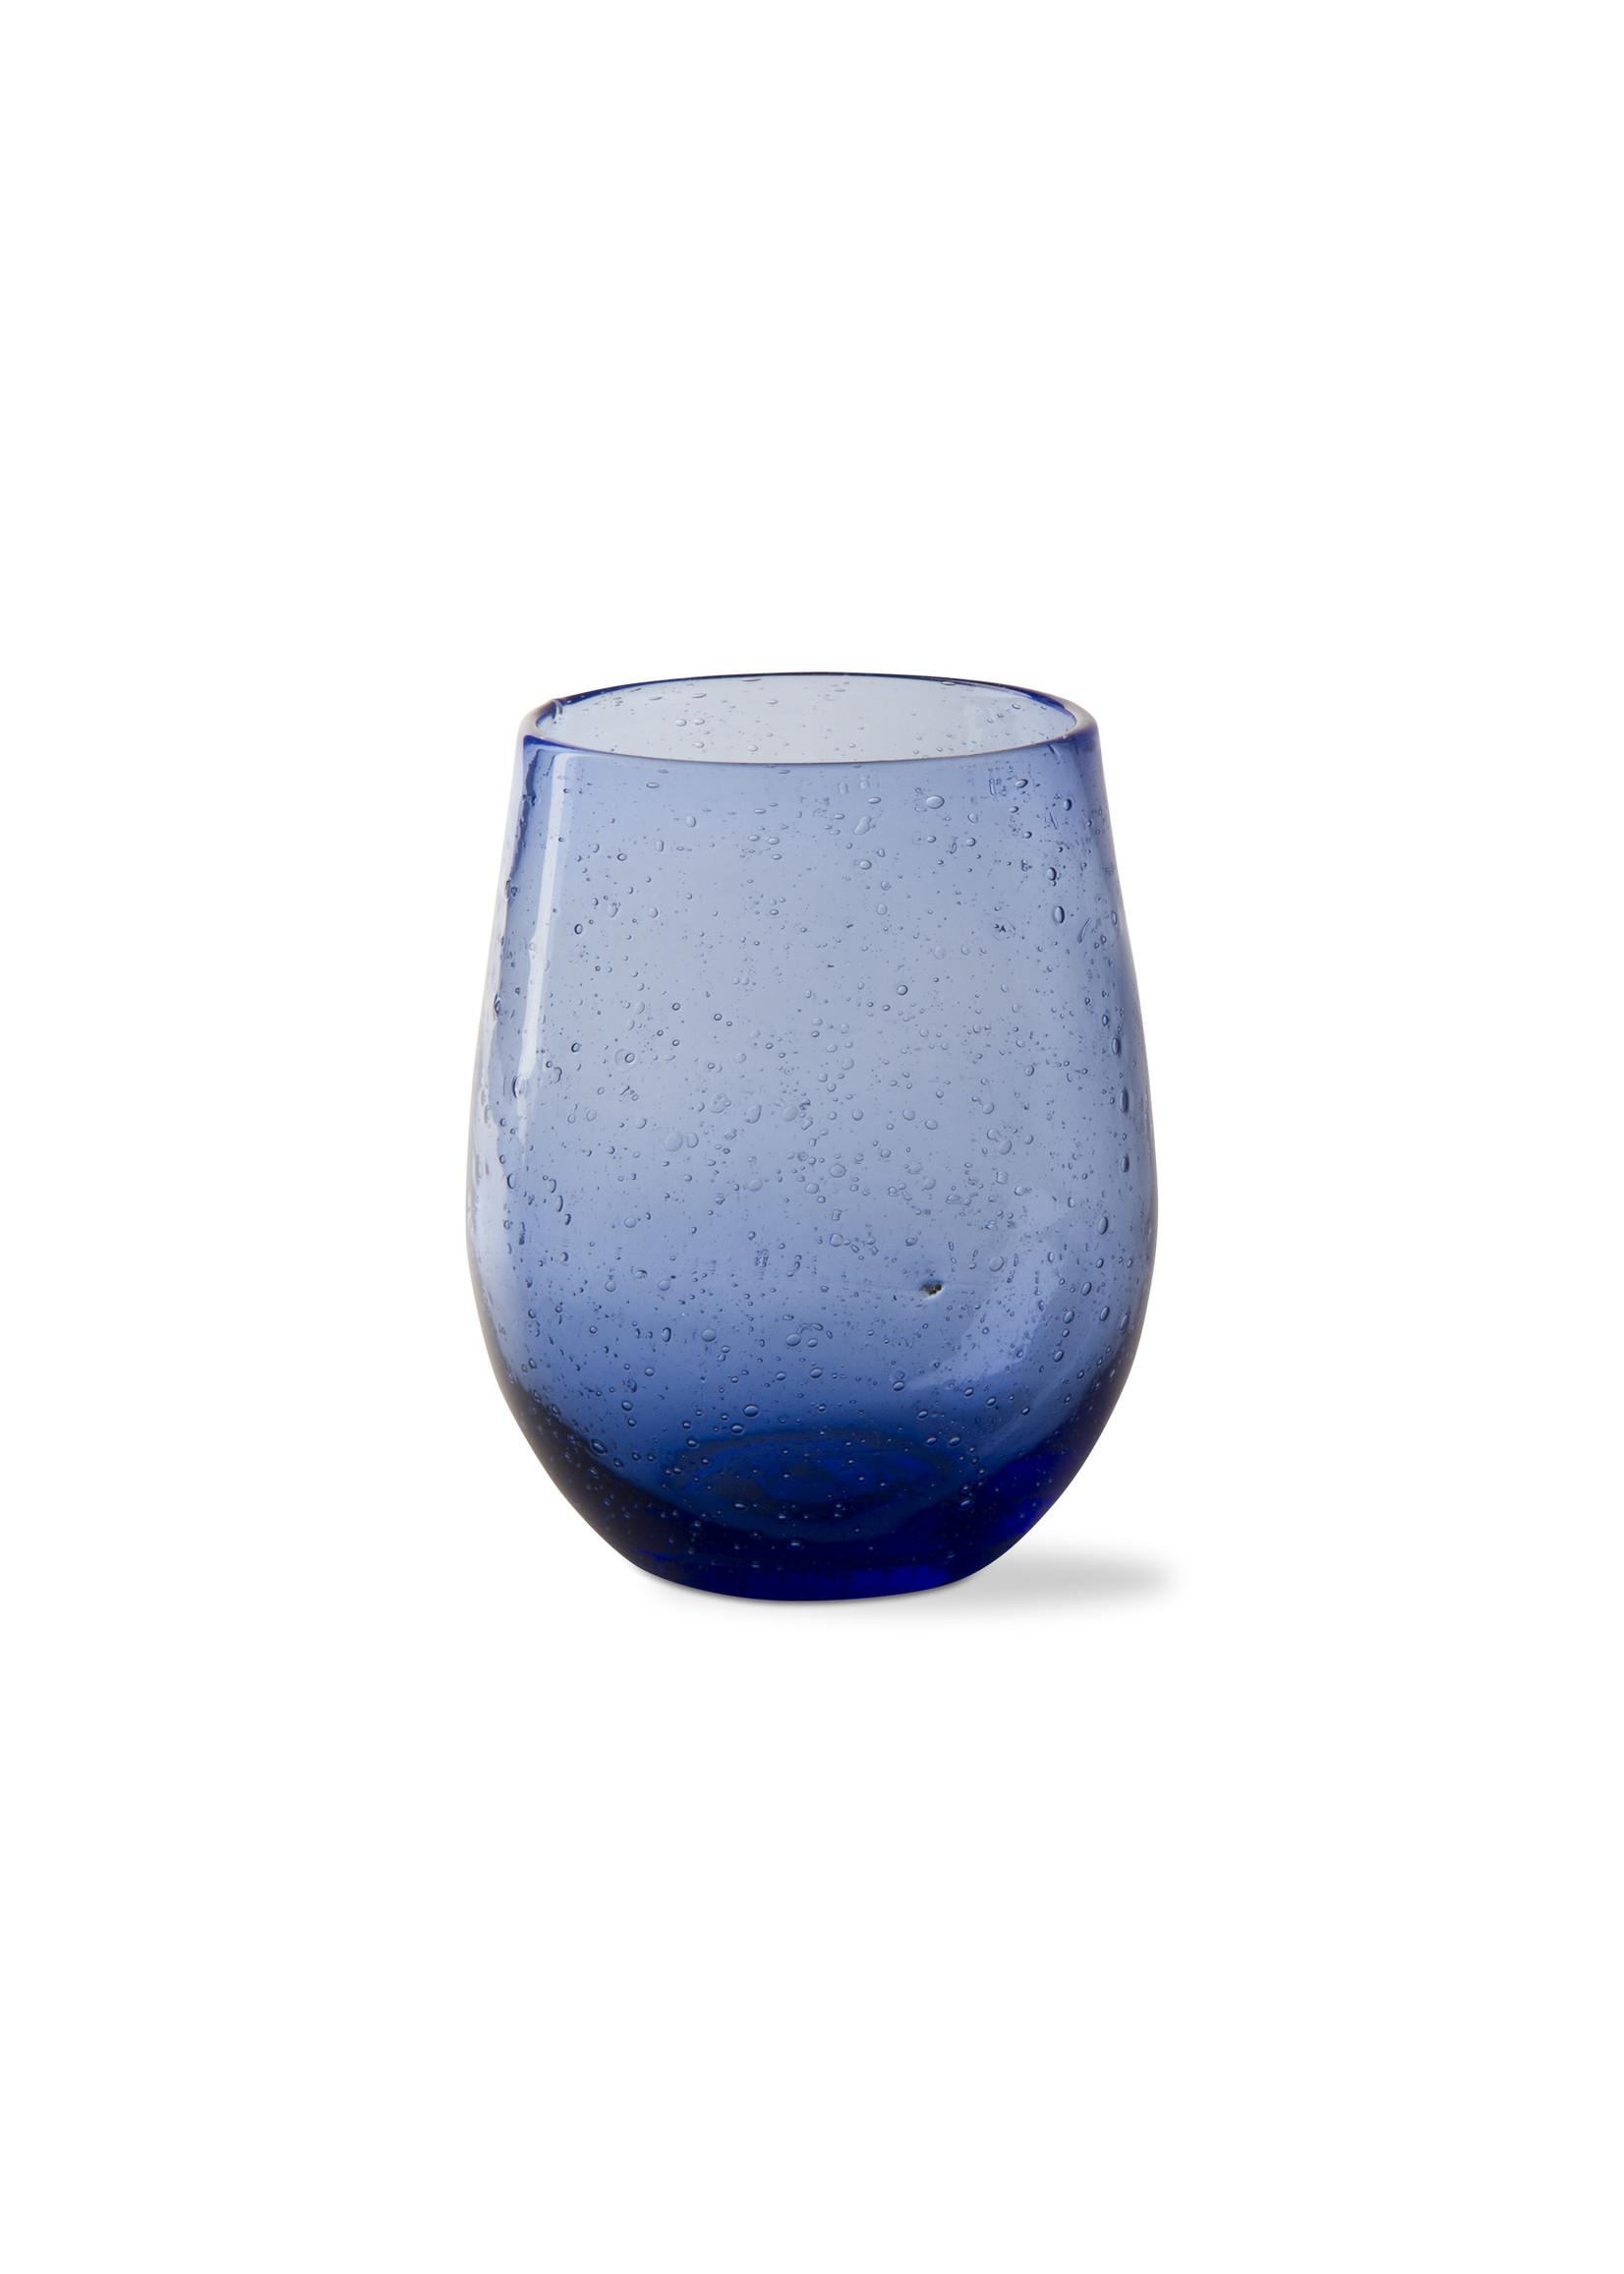 NAVY BUBBLE GLASS STEMLESS WINE GLASS